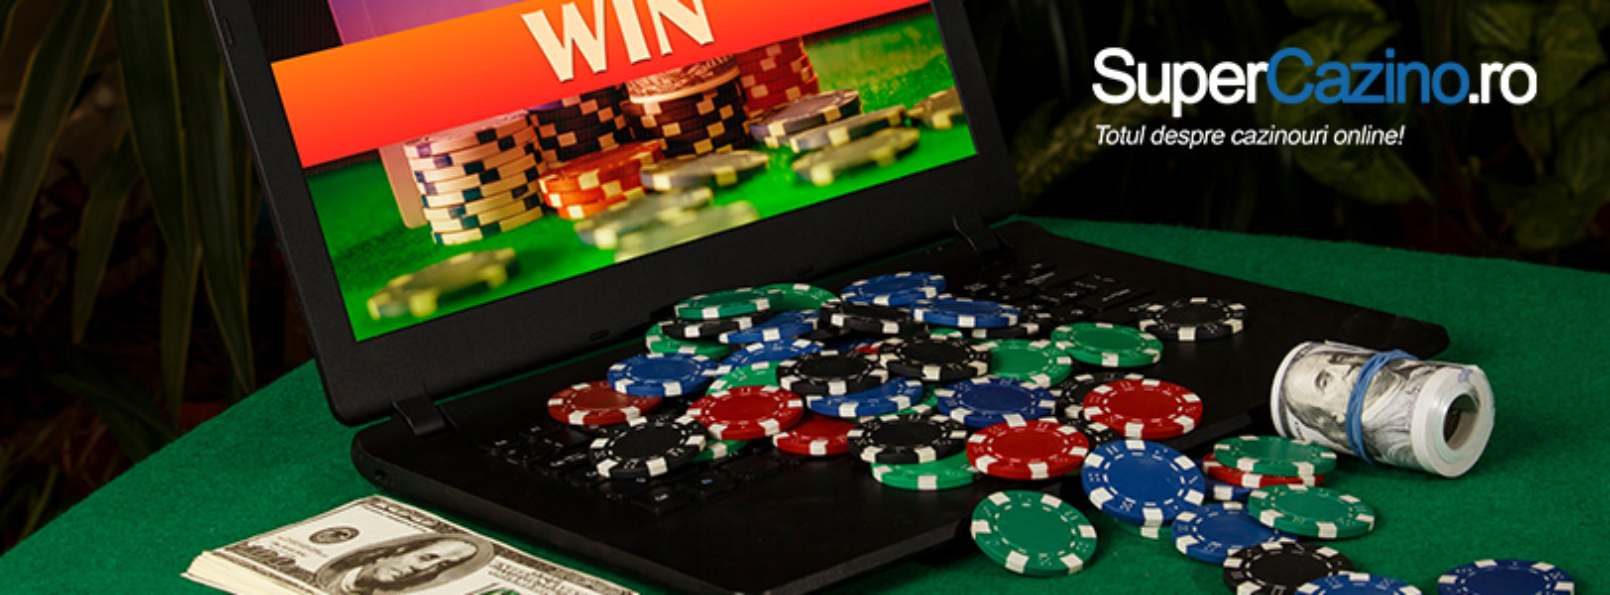 castiga bani online gratis la cazinourile preferate